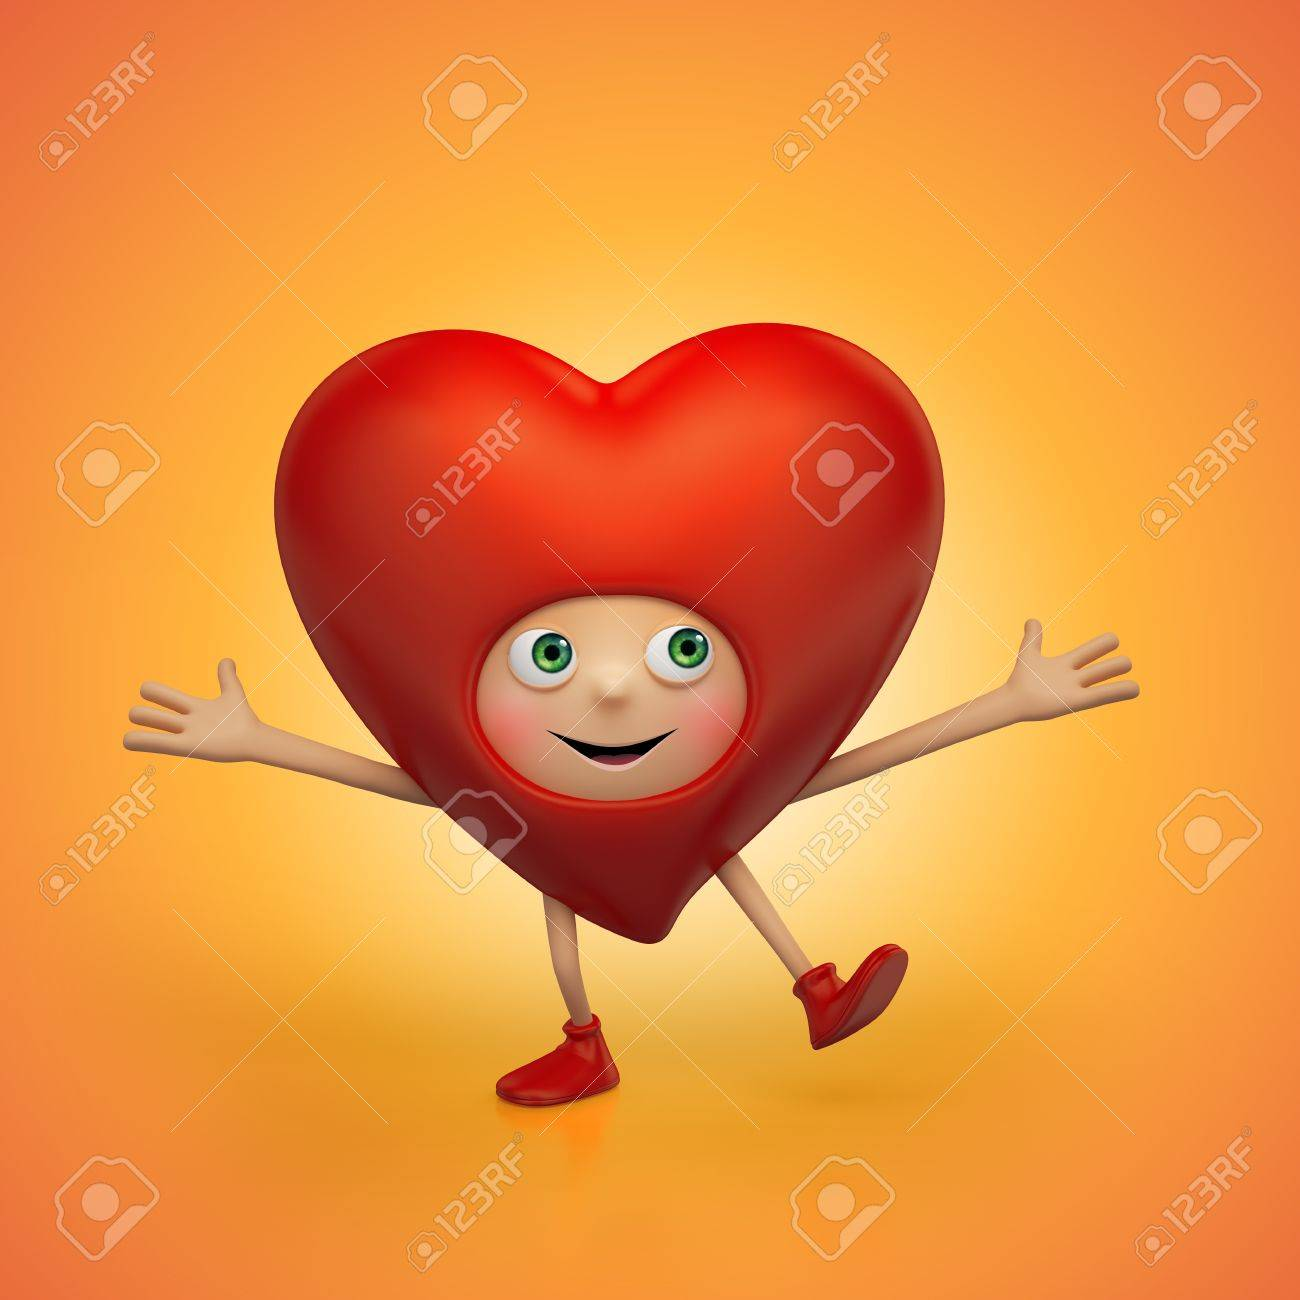 Funny happy red Valentine heart cartoon dancing Stock Photo - 16974869